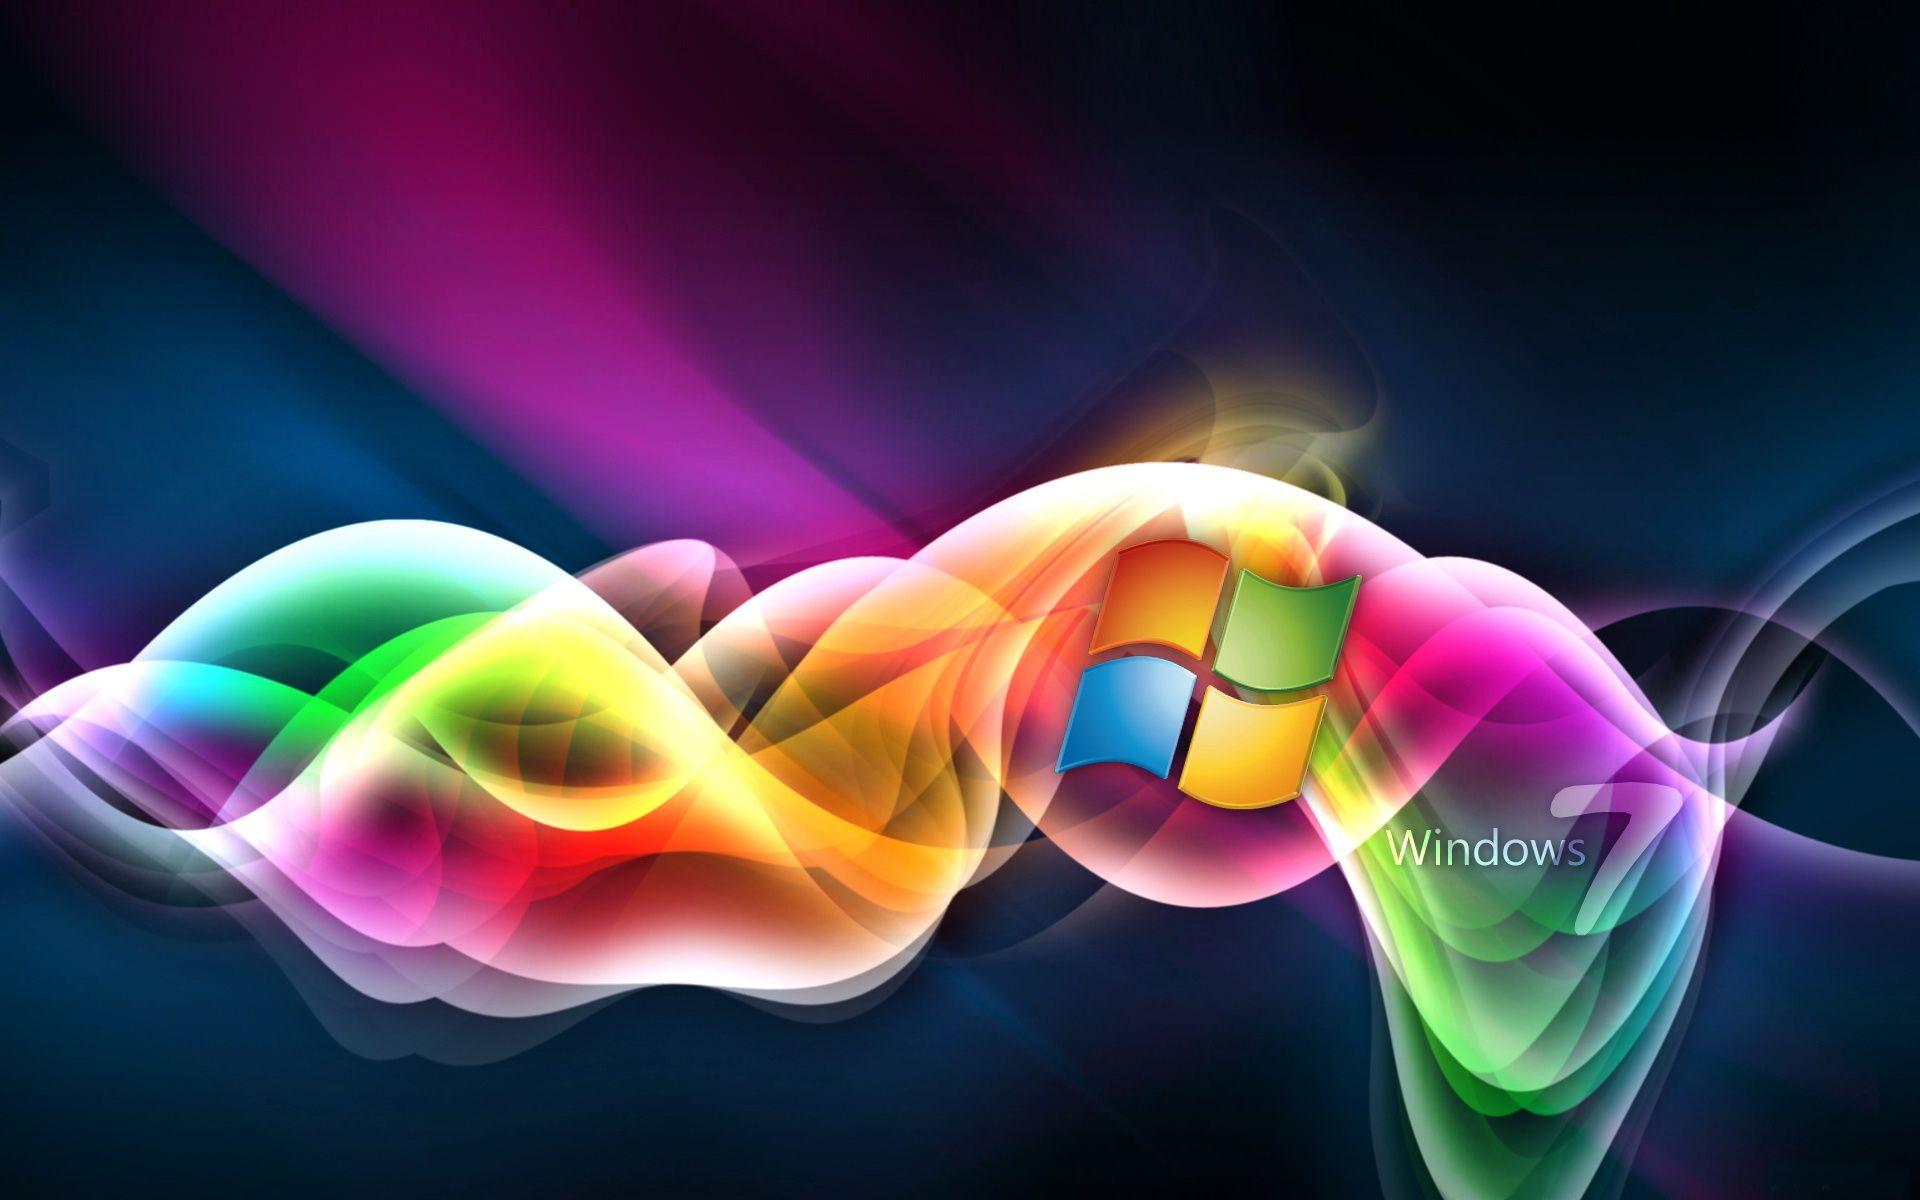 windows desktop wallpaper themes